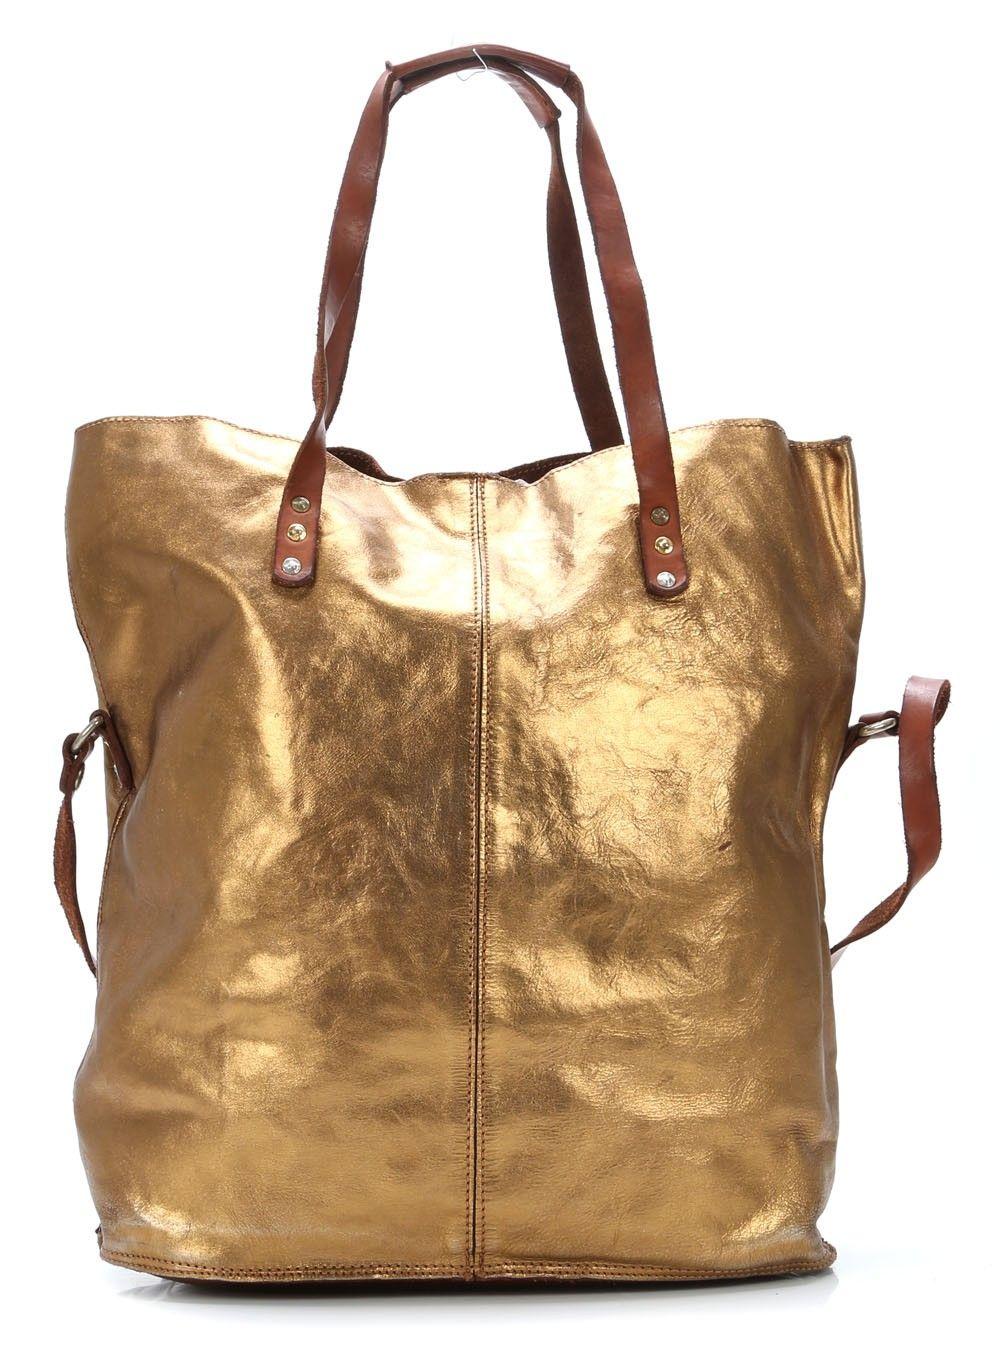 Lavata Tote Leather Gold 45 Cm Campomaggi Taschen Beutel Coole Taschen